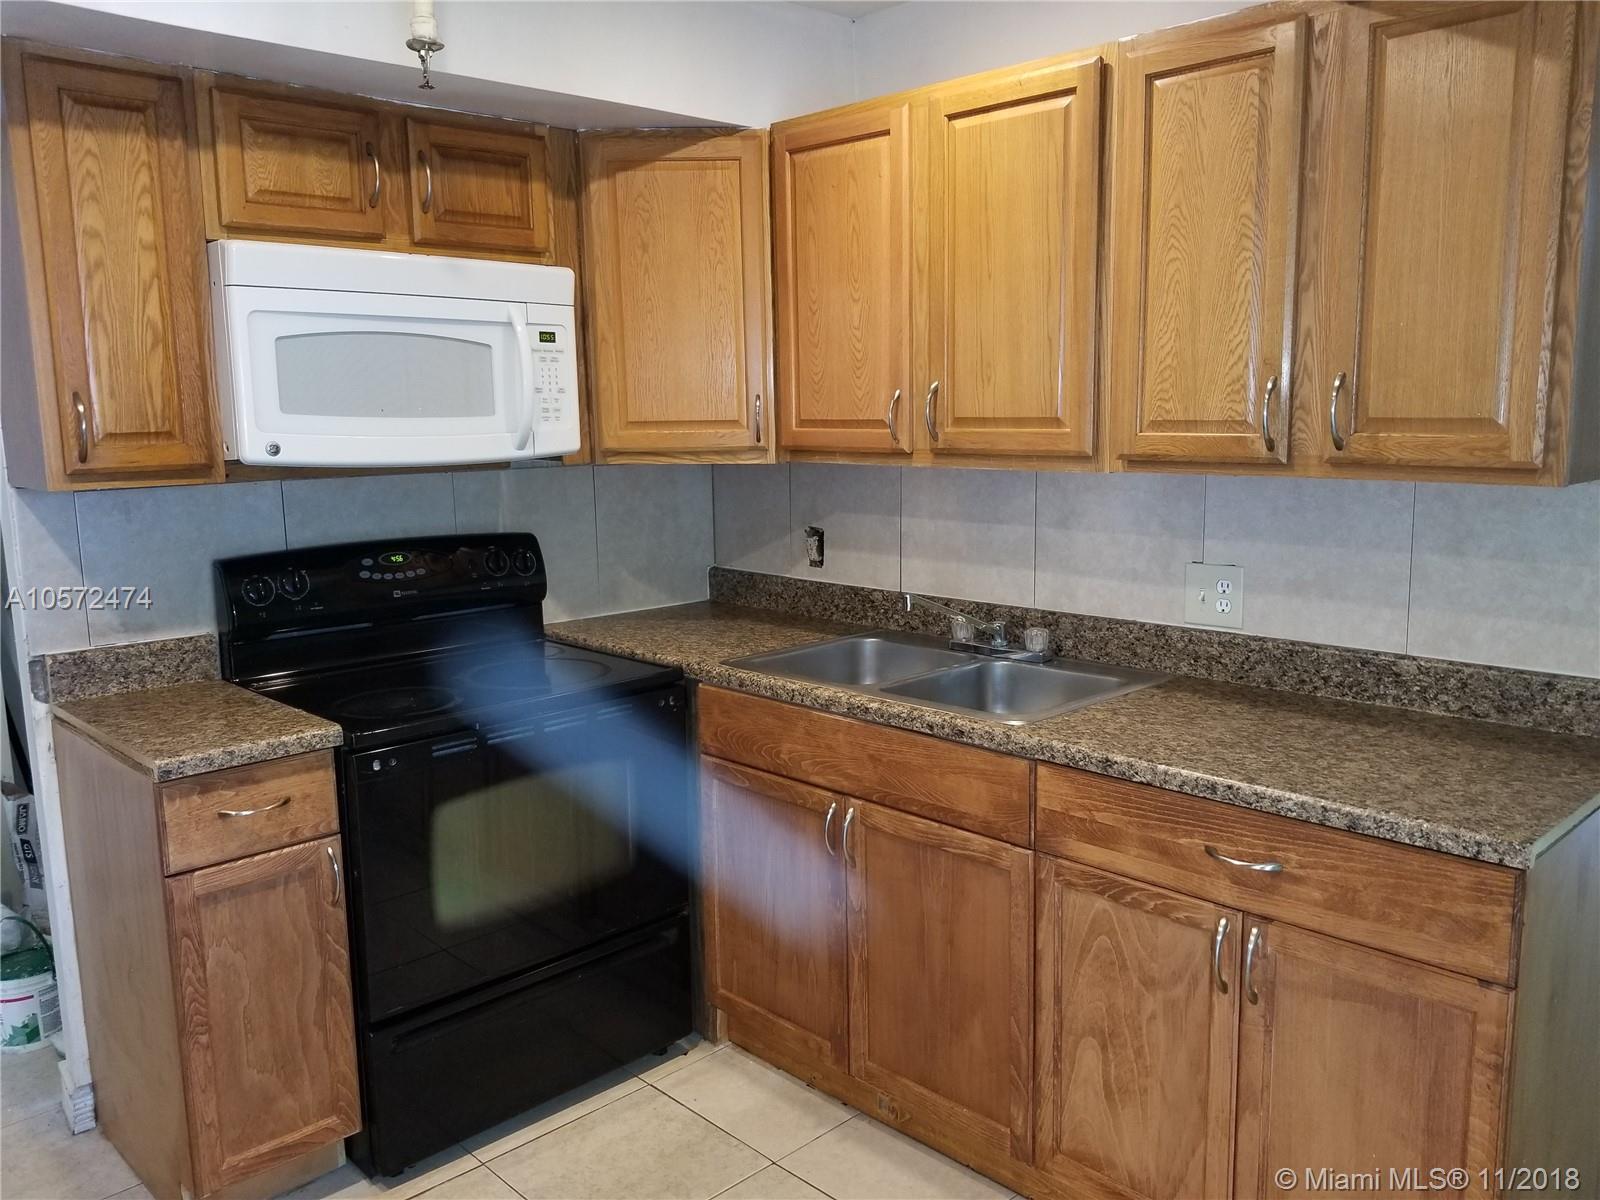 10641 SW 108th Ave #2E For Sale A10572474, FL